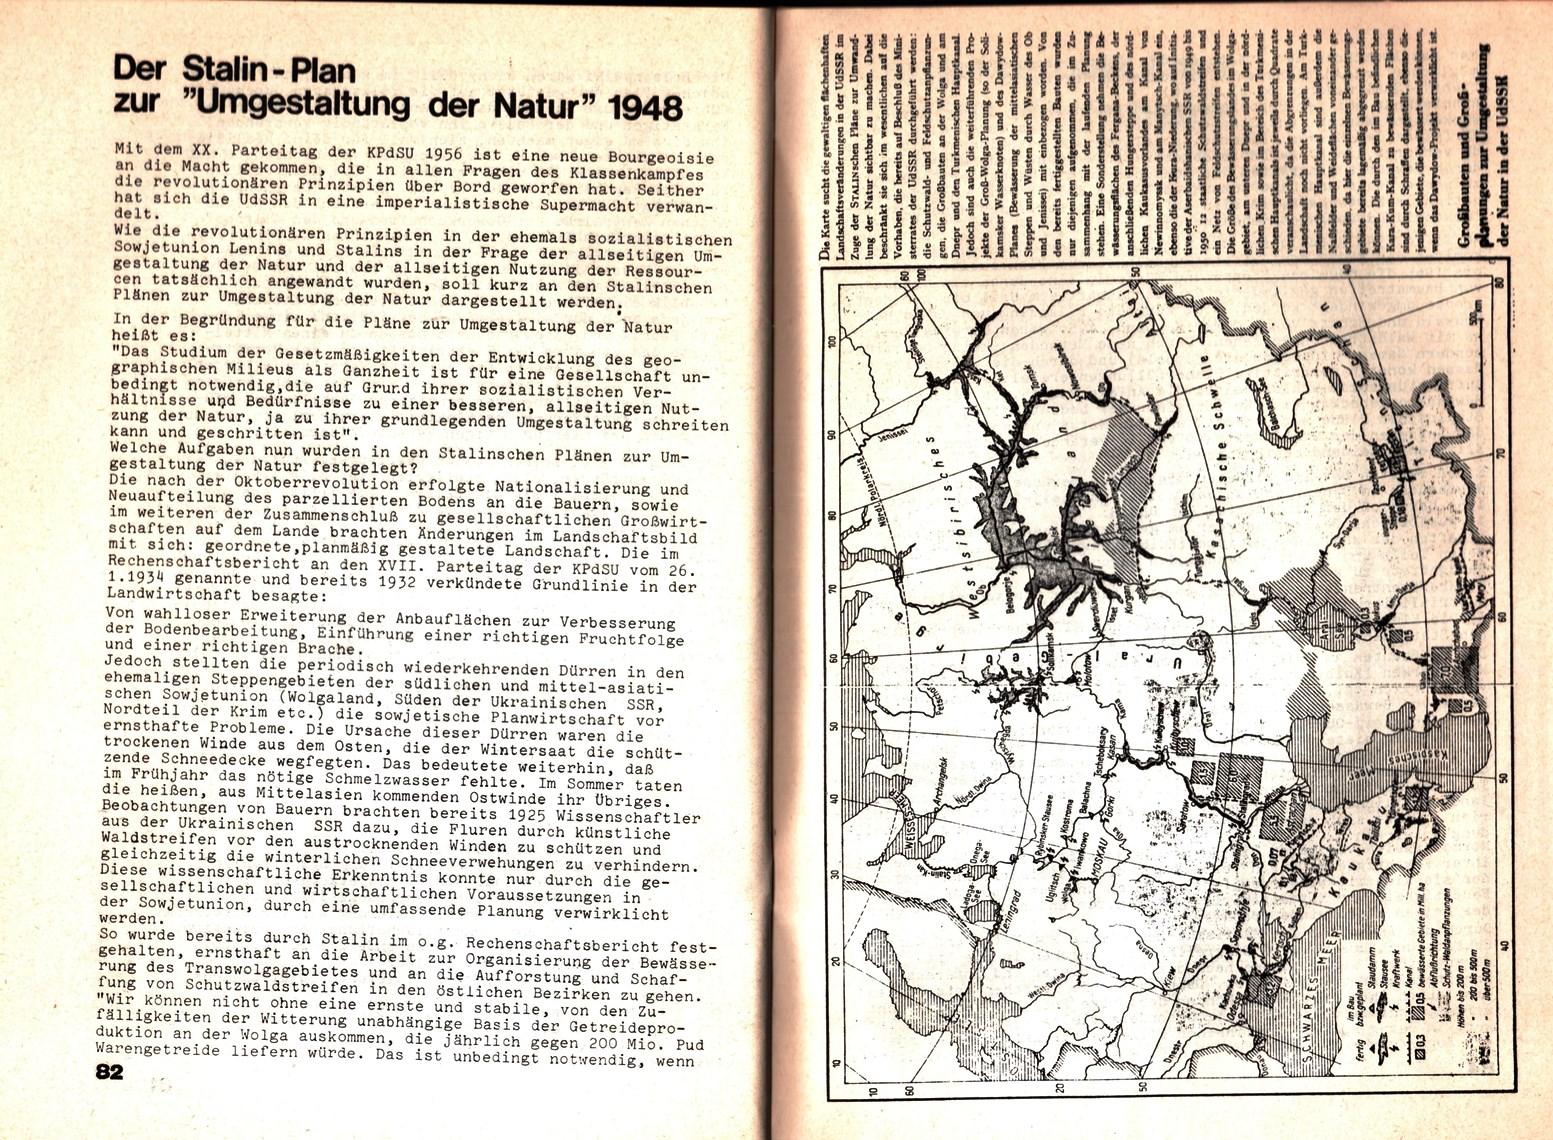 KSV_1976_Atomenergie_im_Kapitalismus_043